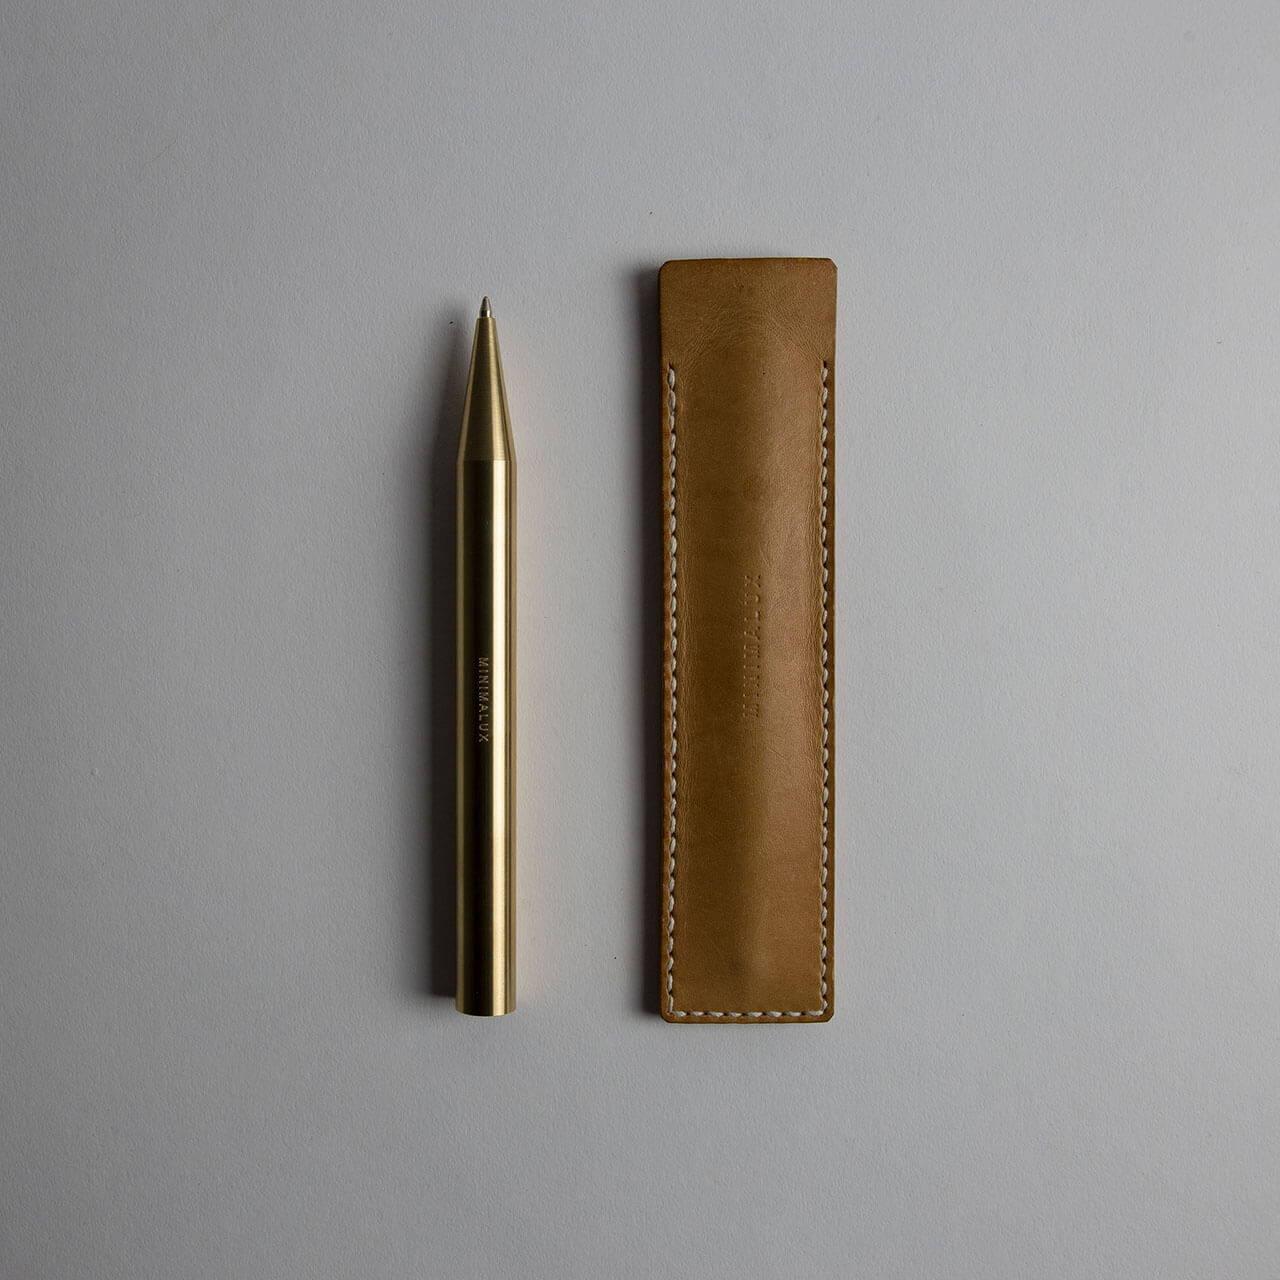 Brass Ballpoint Pen with Leather Pen Sleeve